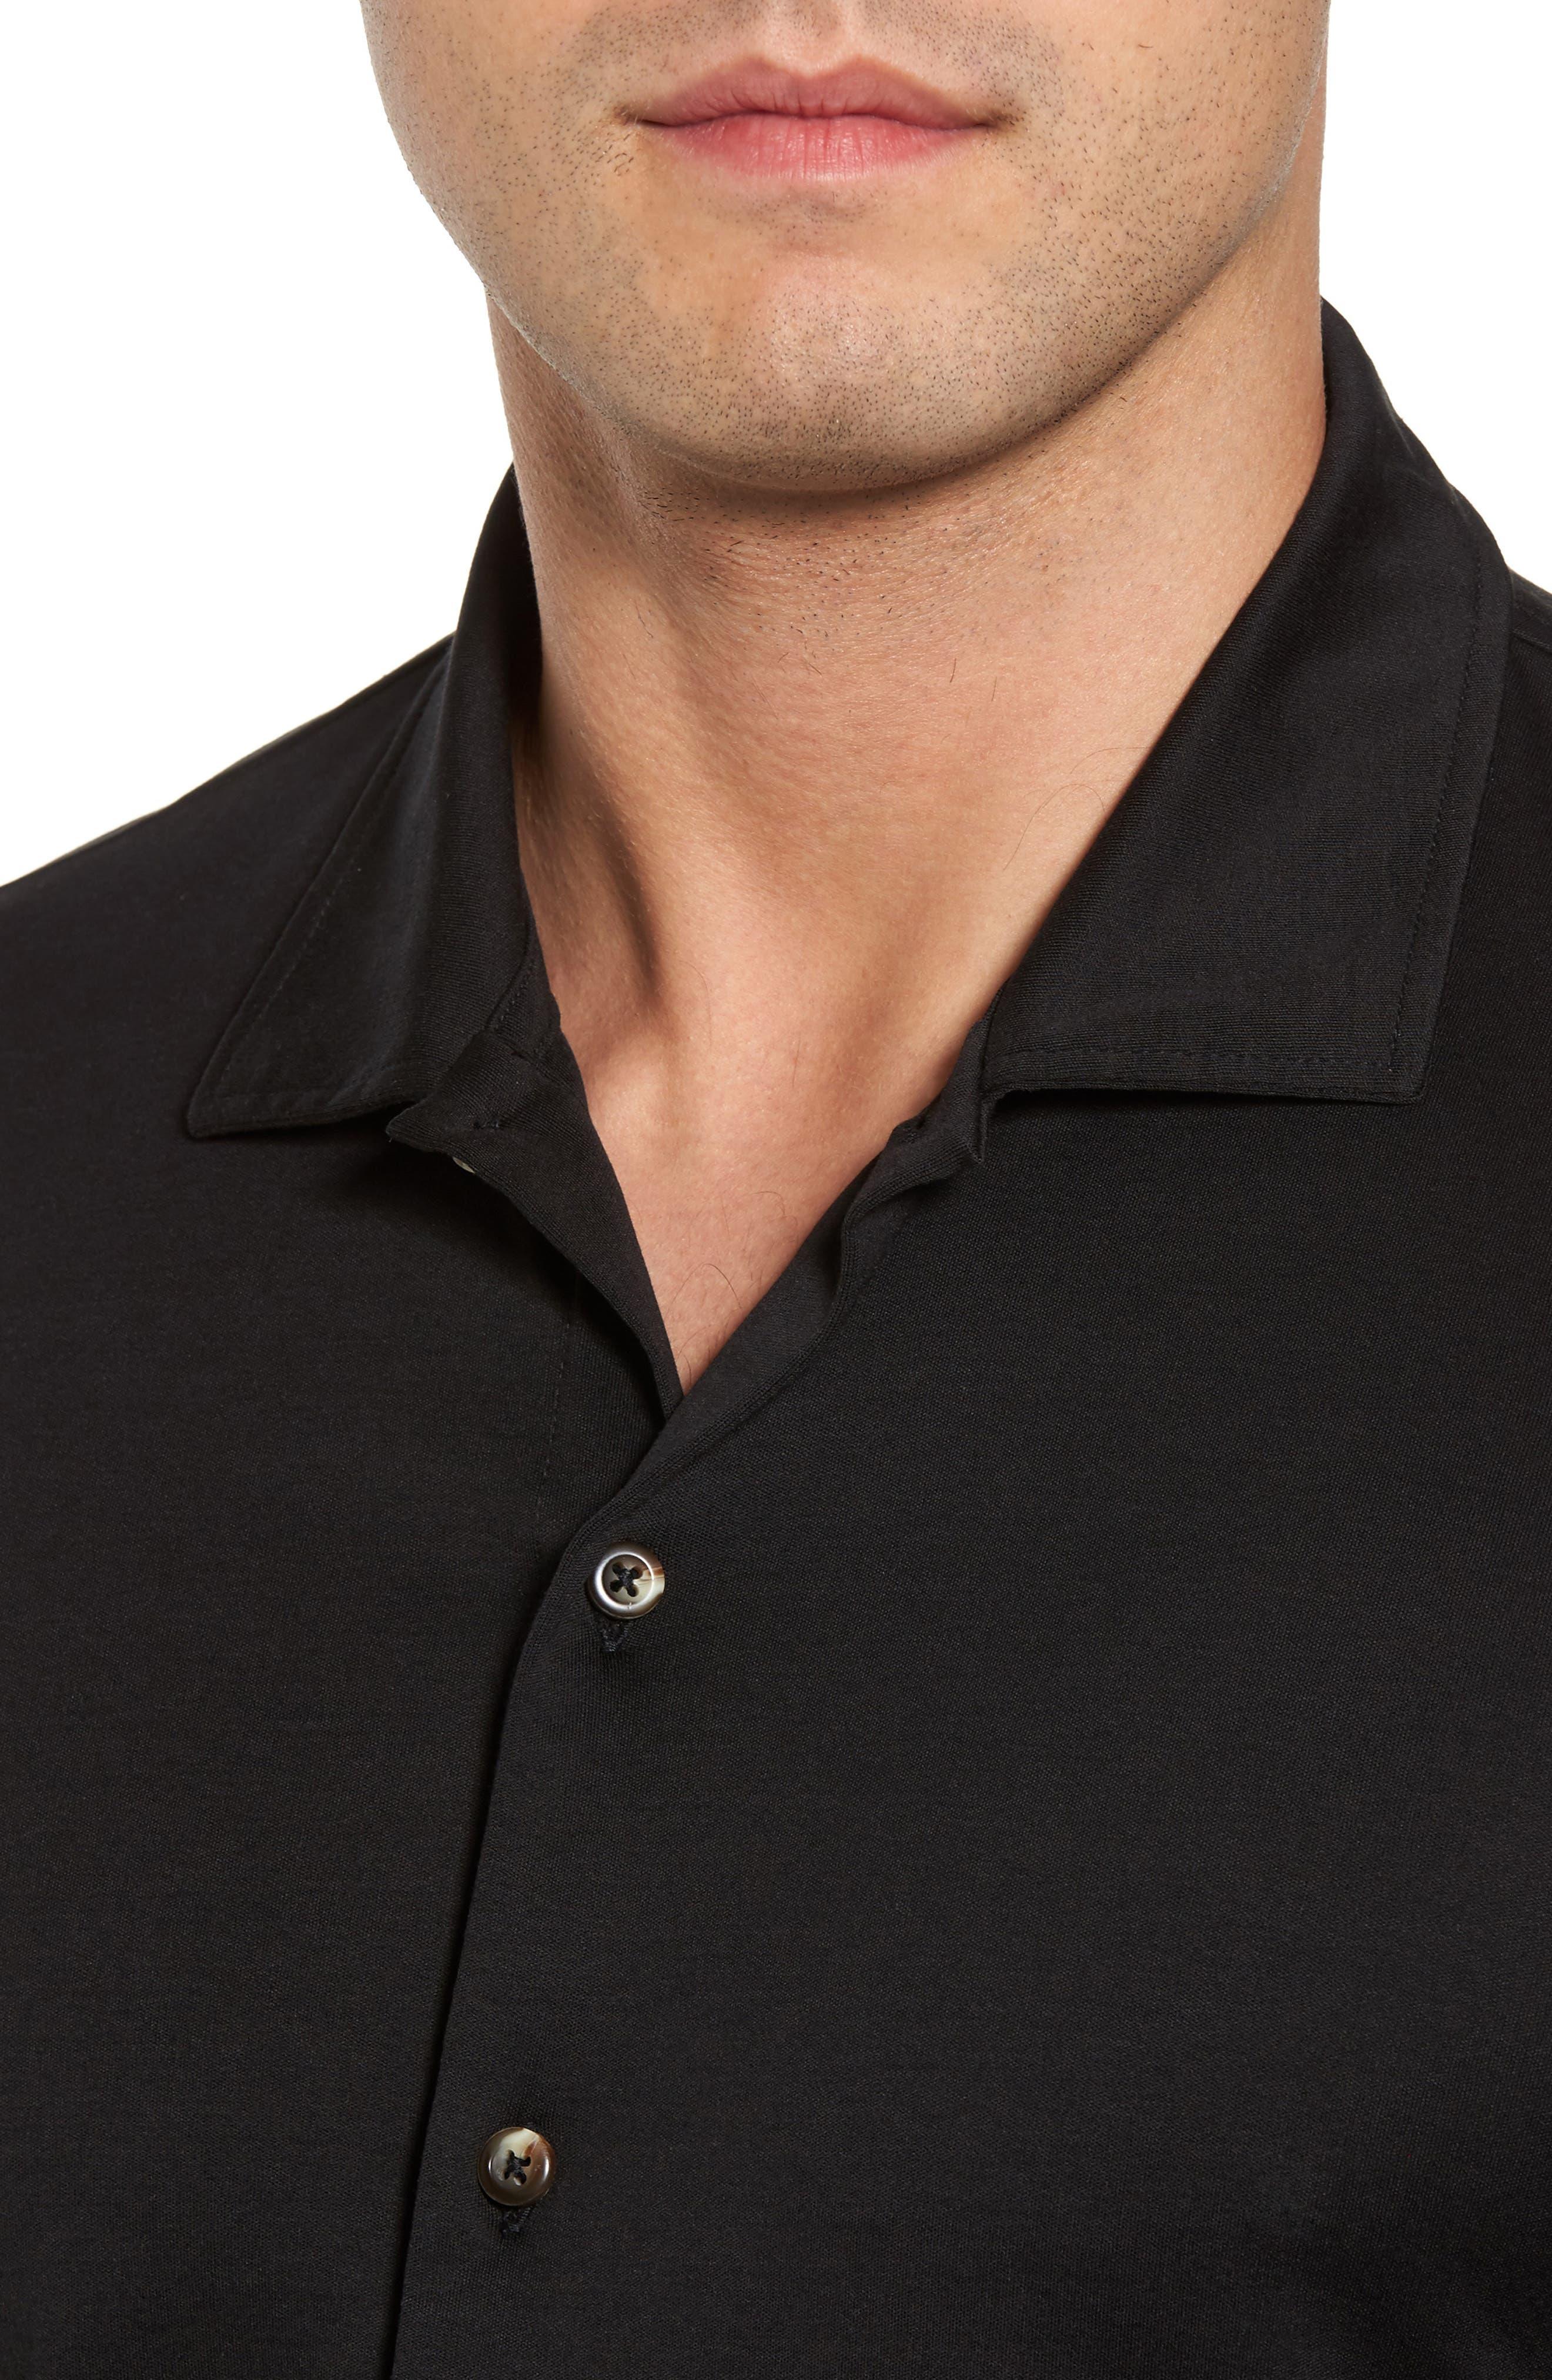 Interlock Knit Sport Shirt,                             Alternate thumbnail 4, color,                             002